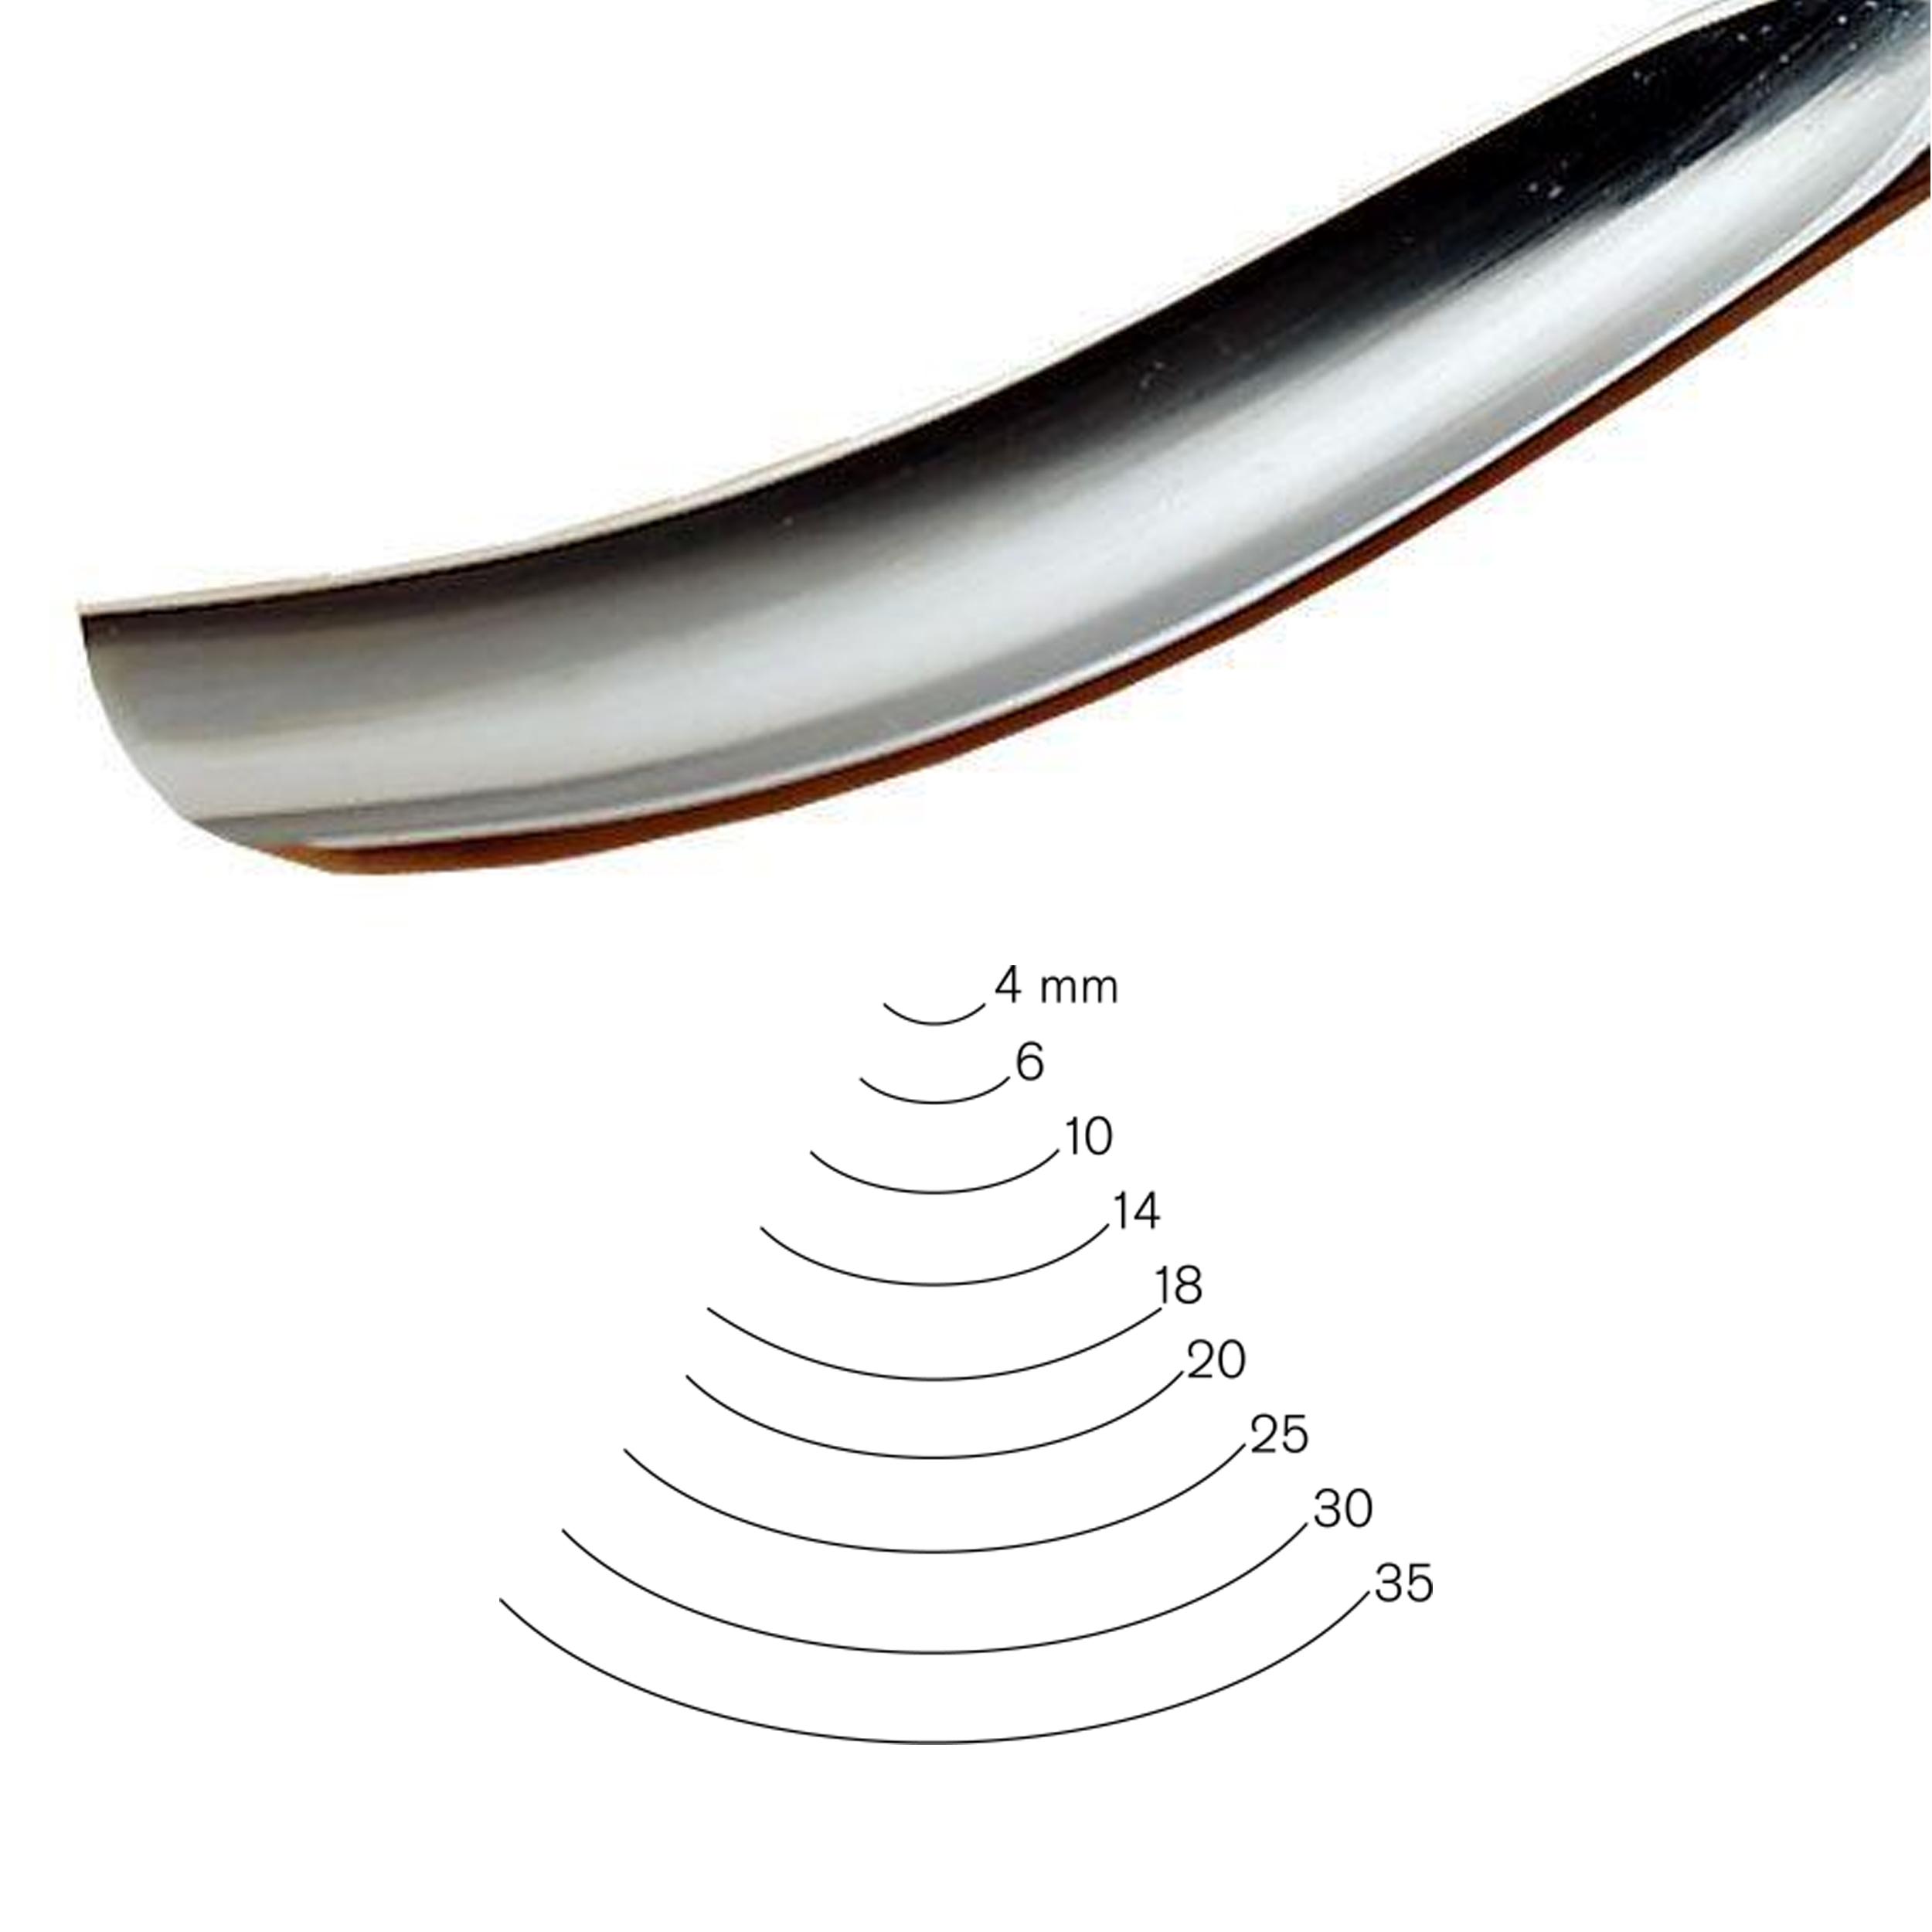 #7 Sweep Bent Gouge 20 mm, Full Size